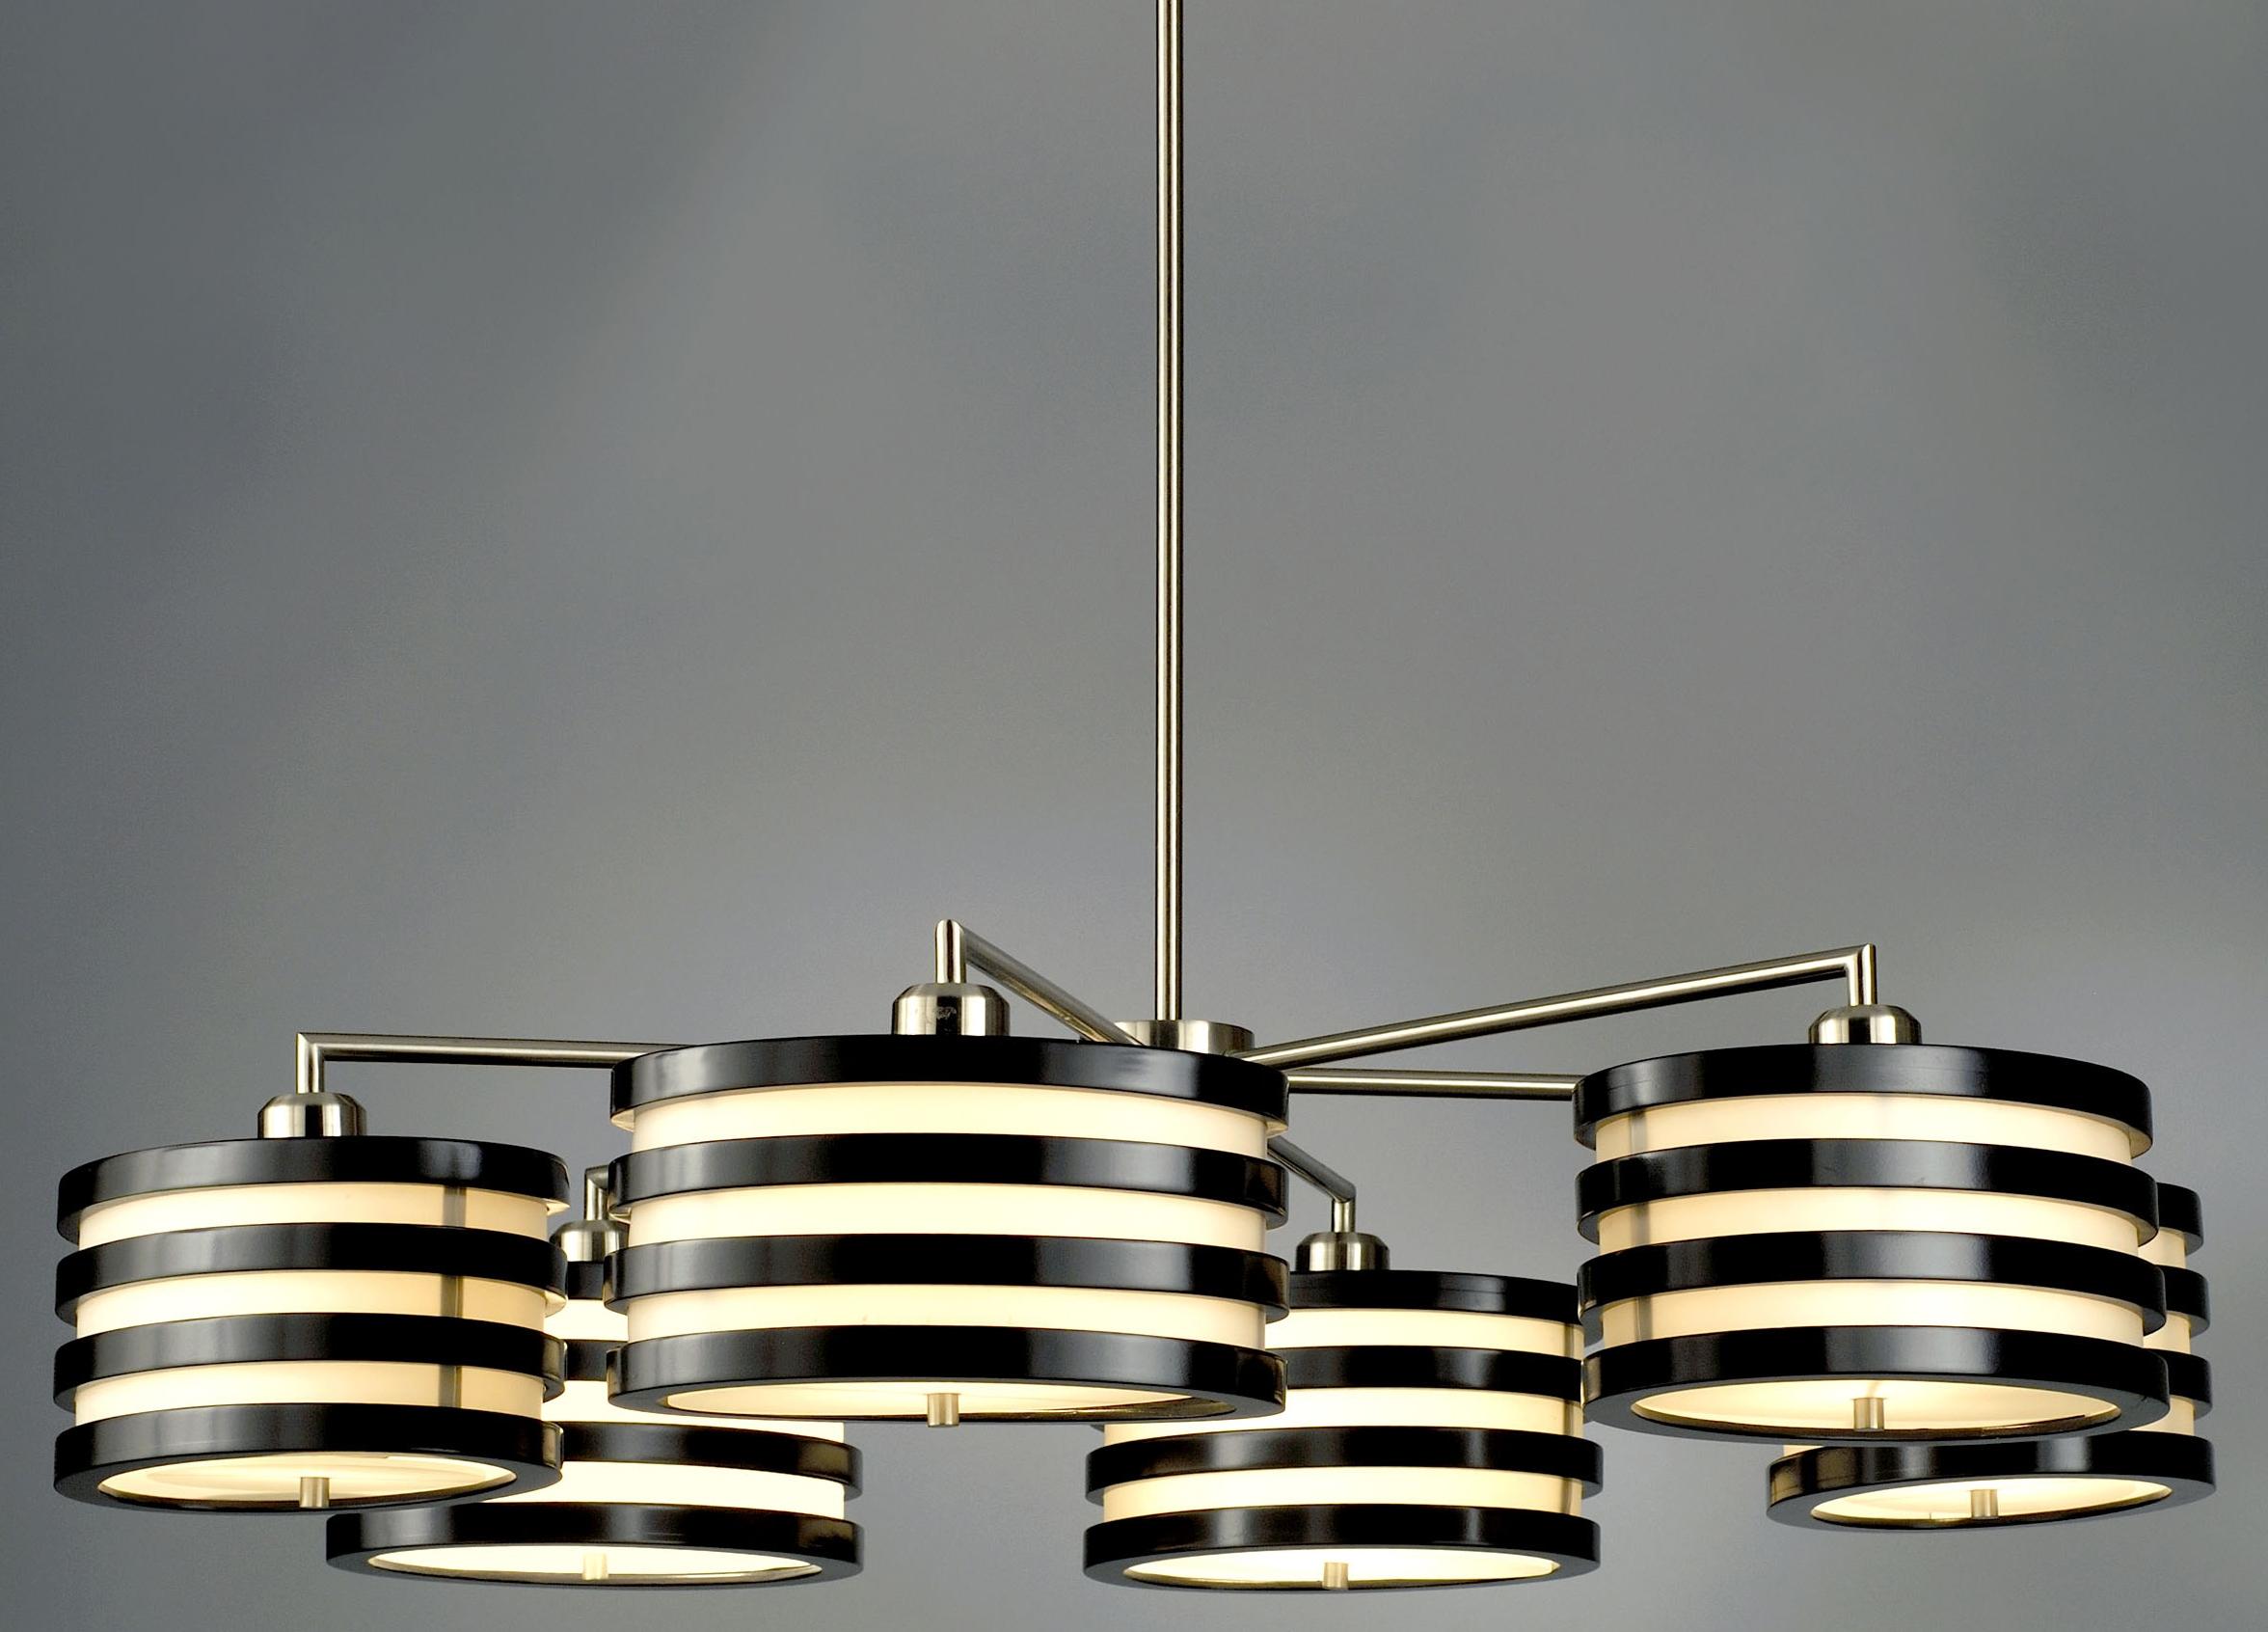 Modern Chandelier Light Fixtures Alexsullivanfund Intended For Contemporary Chandelier (#11 of 12)